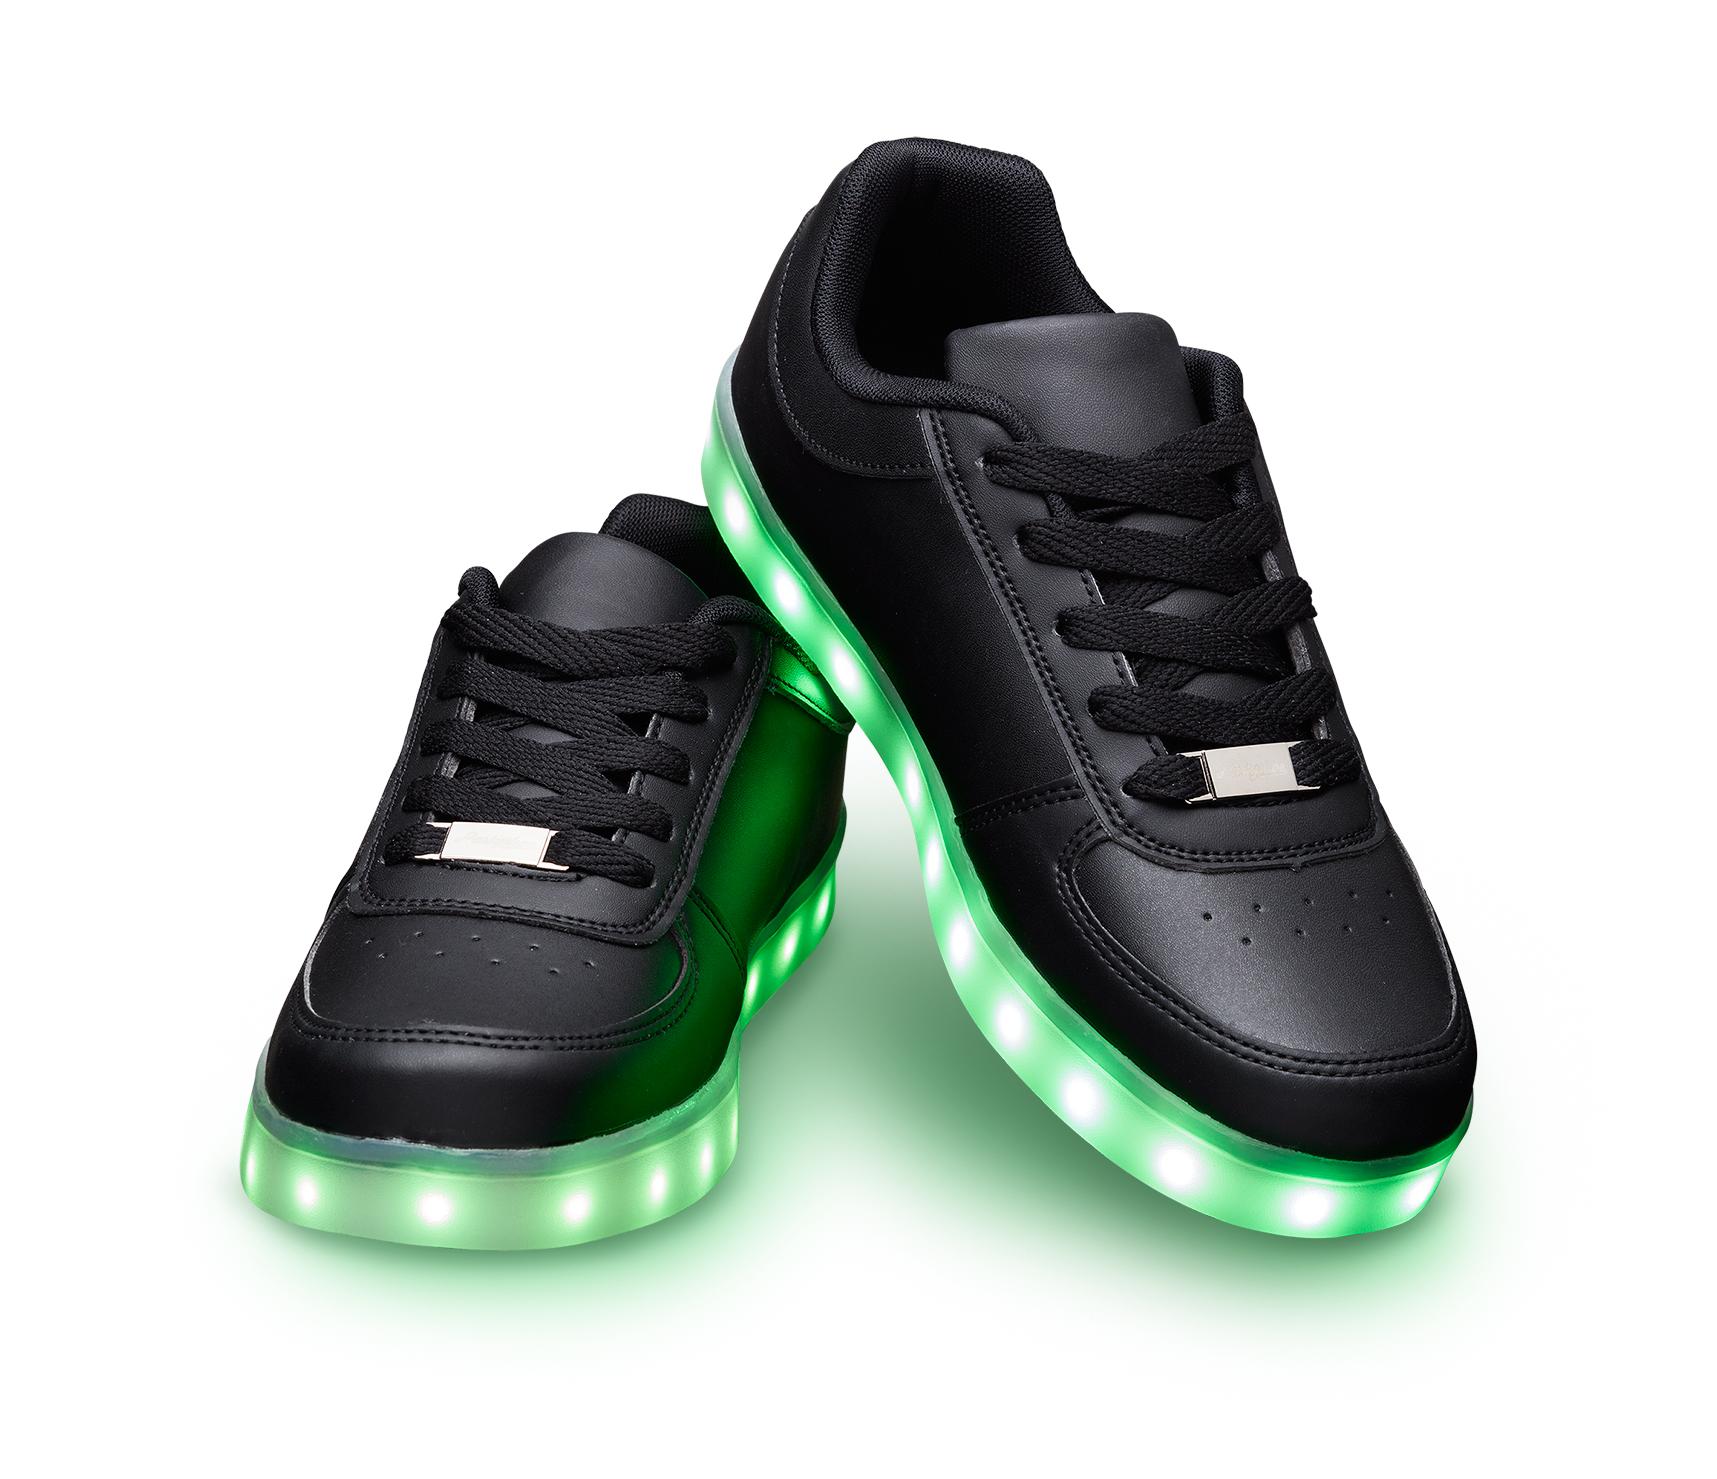 LED Shoes black - Partyshoe